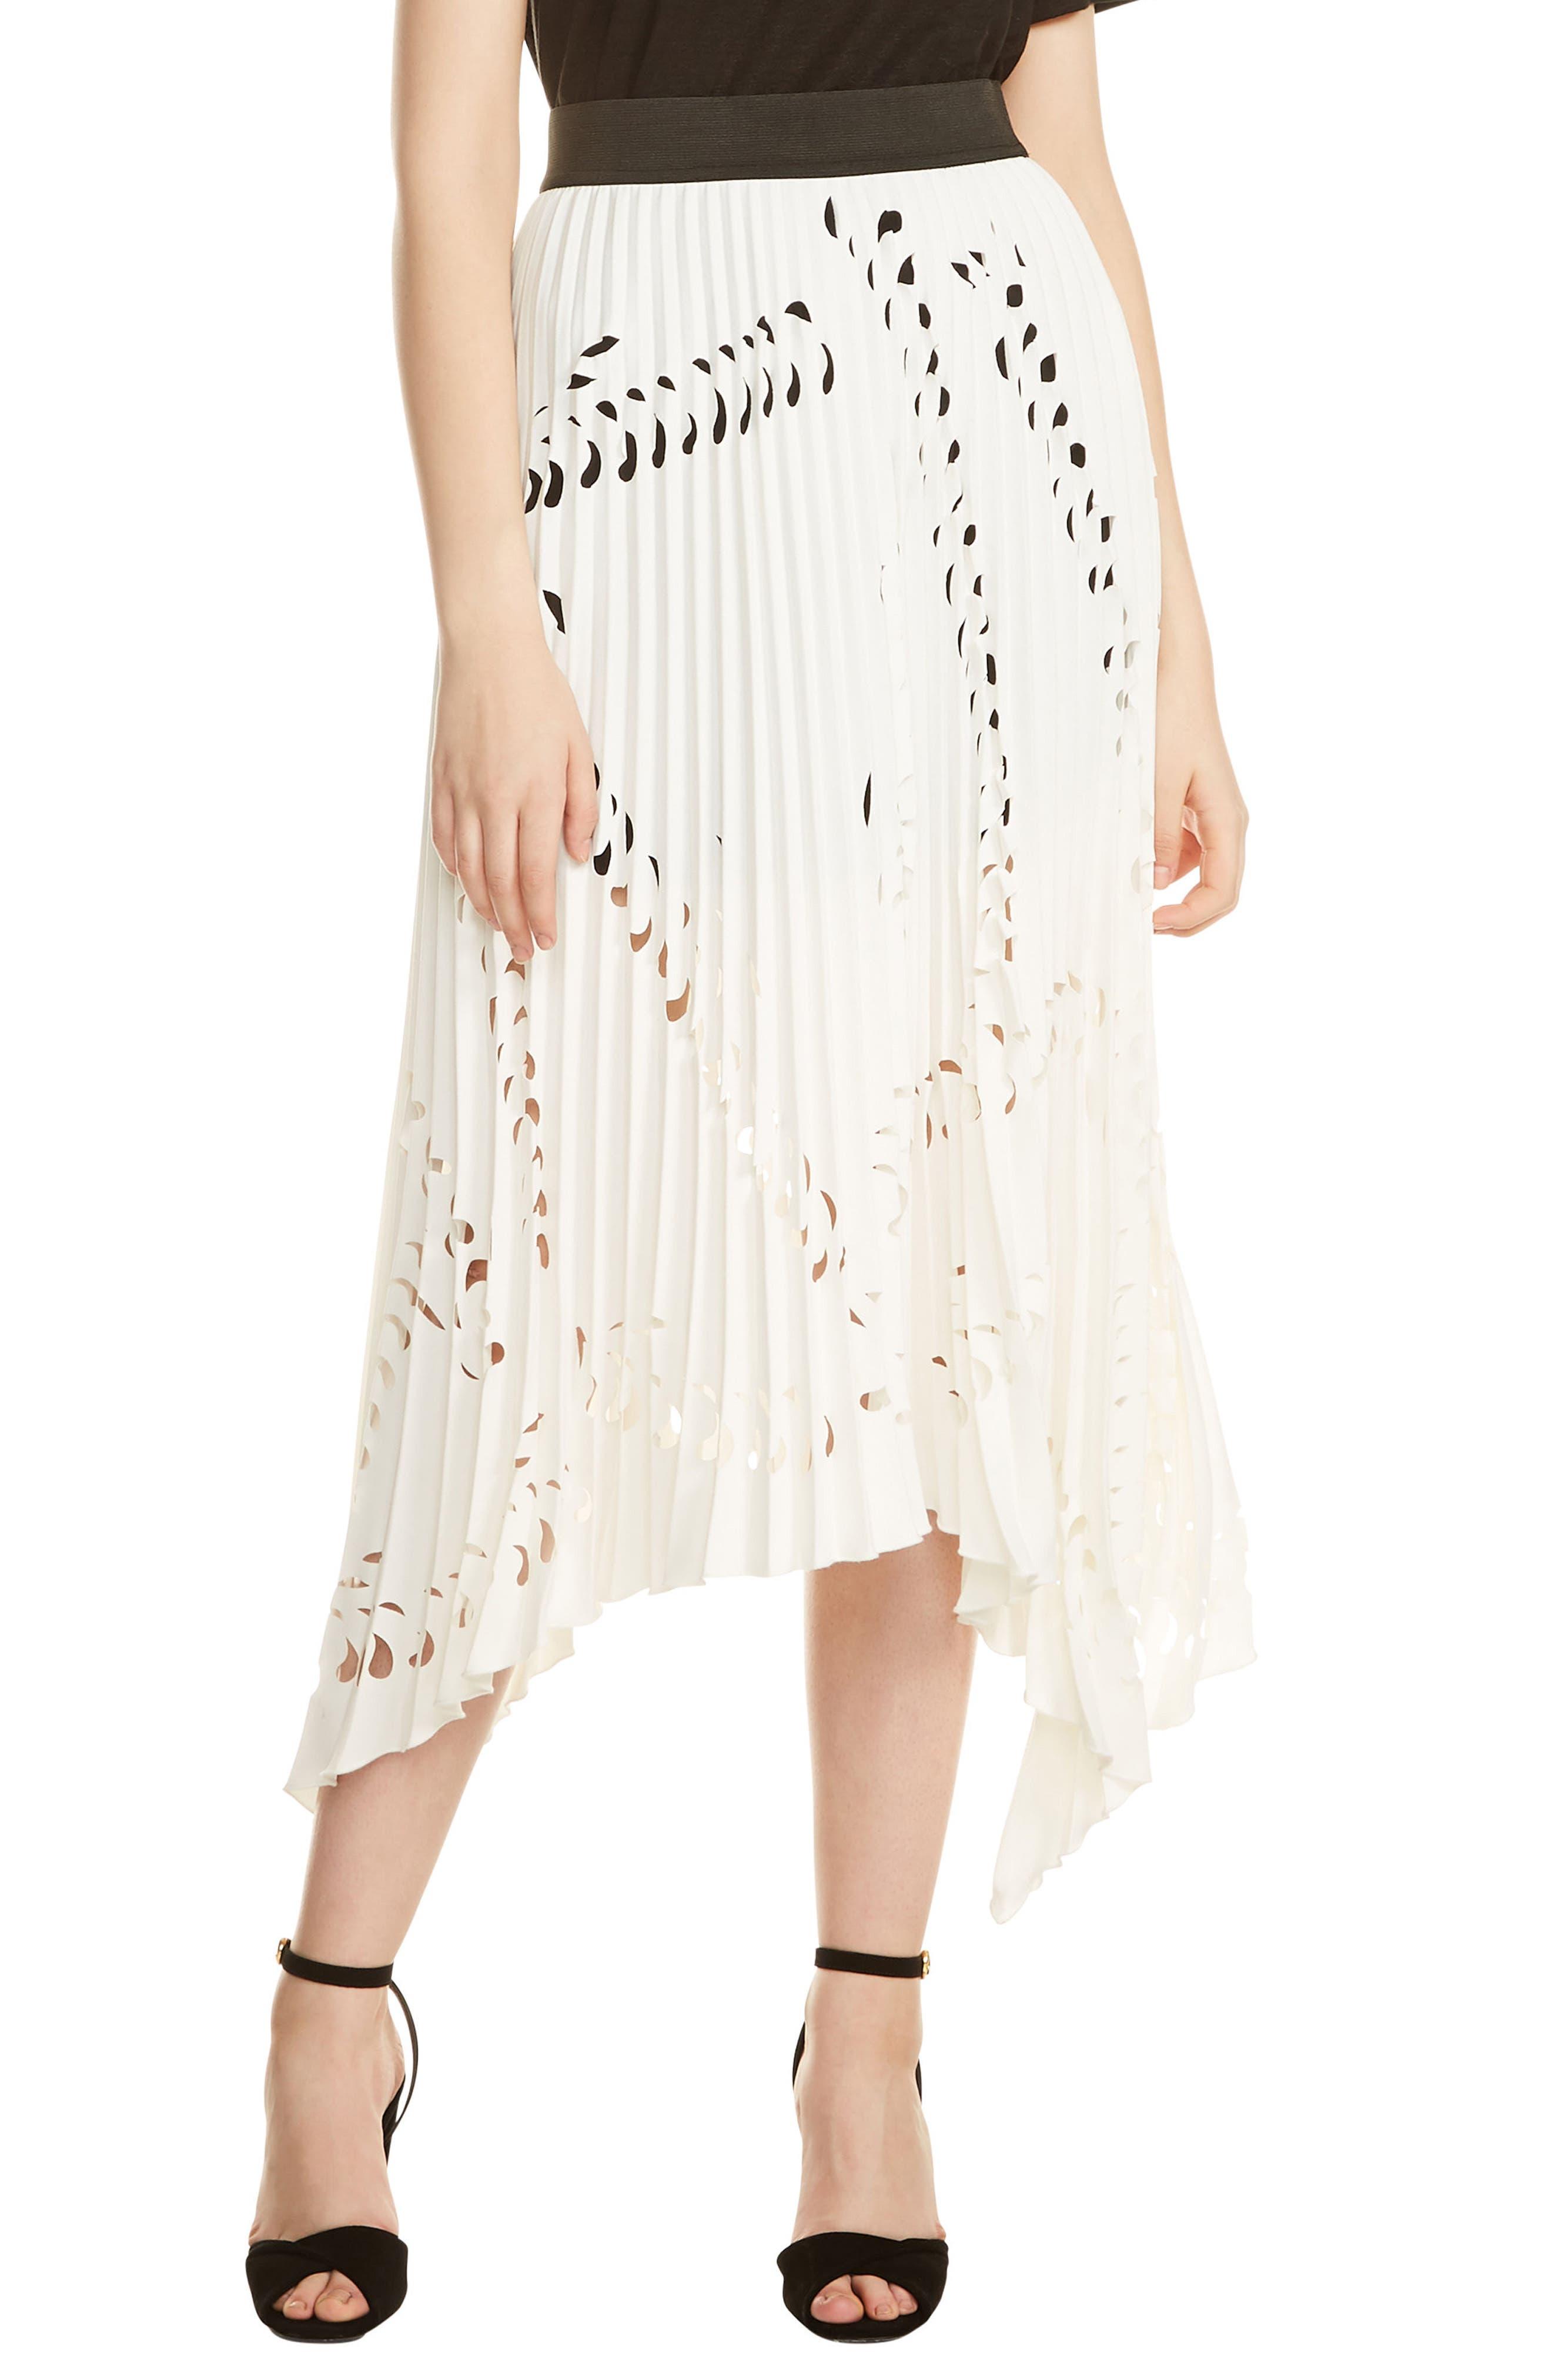 Jeflexe Cutout Pleat Midi Skirt,                             Main thumbnail 1, color,                             Blanc